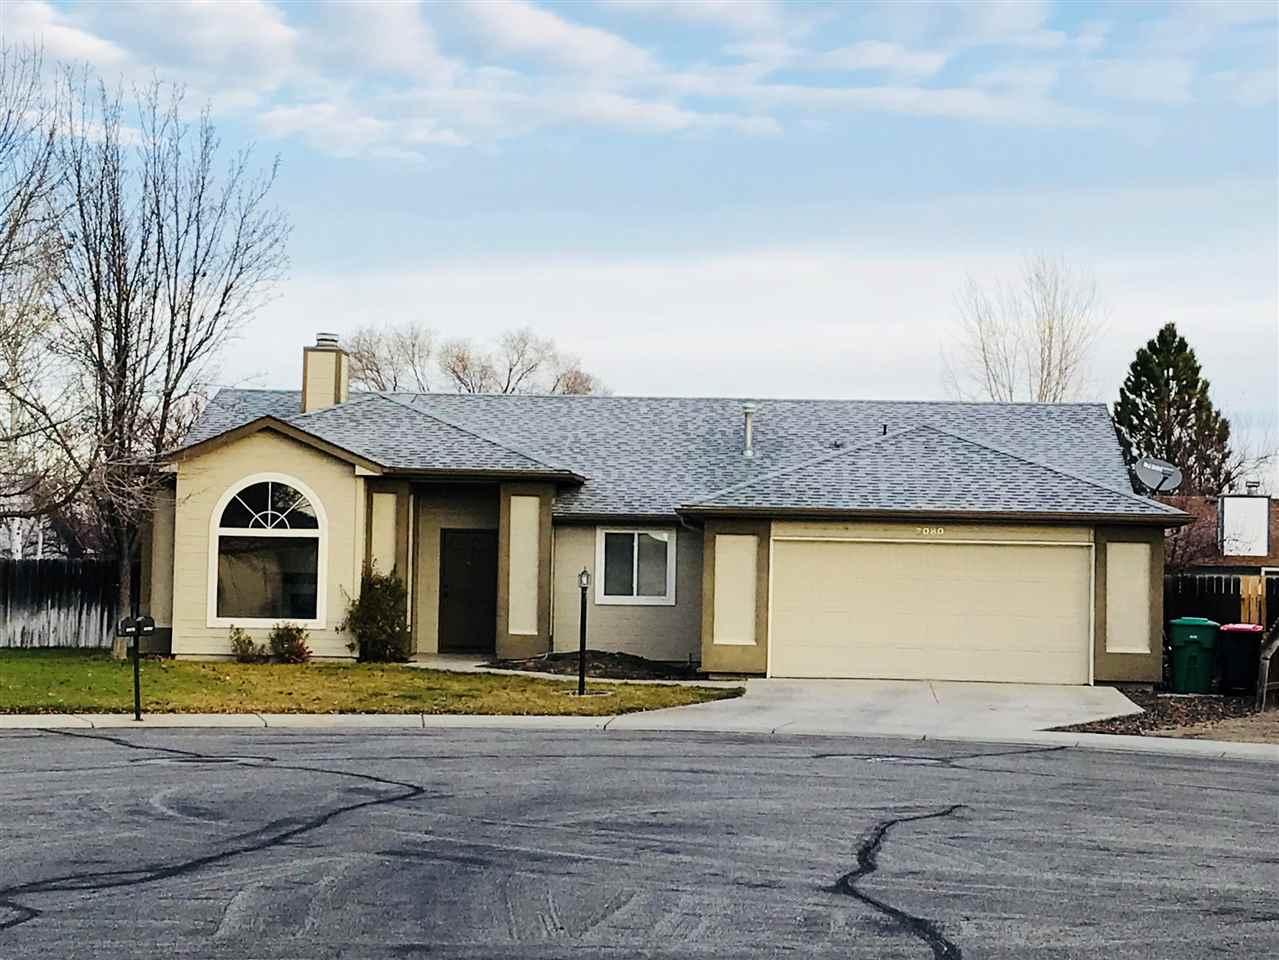 2080 N Sequoia Place, Meridian, Idaho 83646, 3 Bedrooms, 2 Bathrooms, Rental For Rent, Price $1,450, 98676851